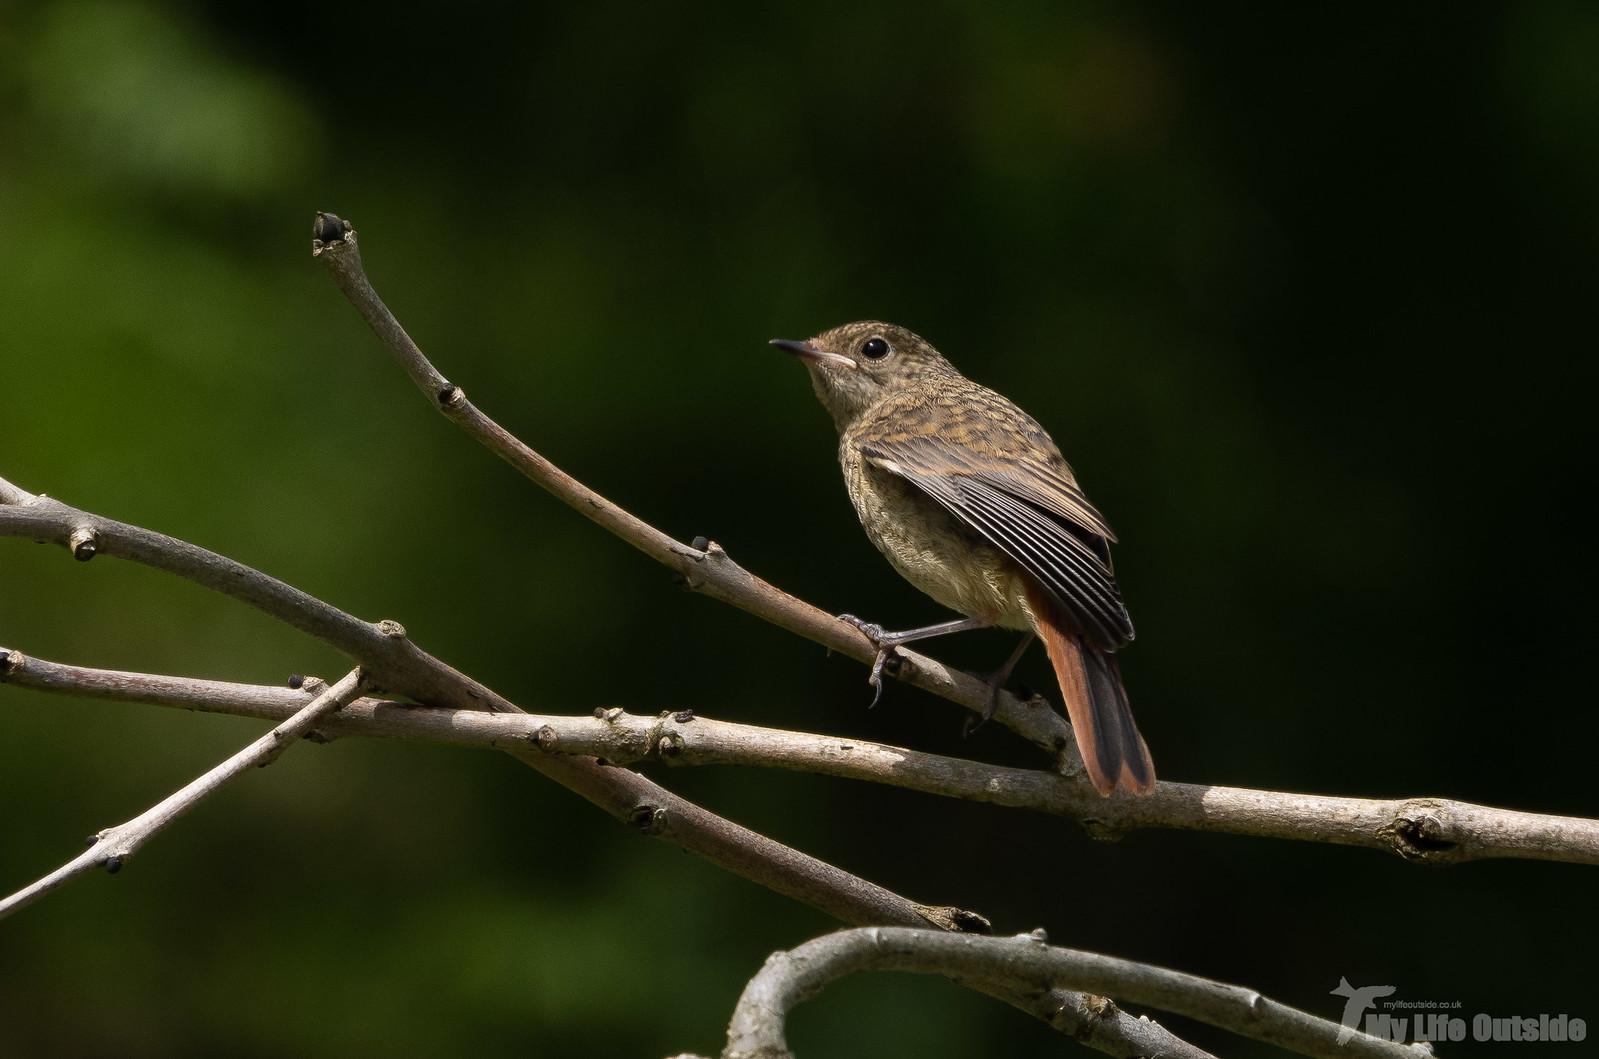 P6253349 - Redstart, Dinefwr